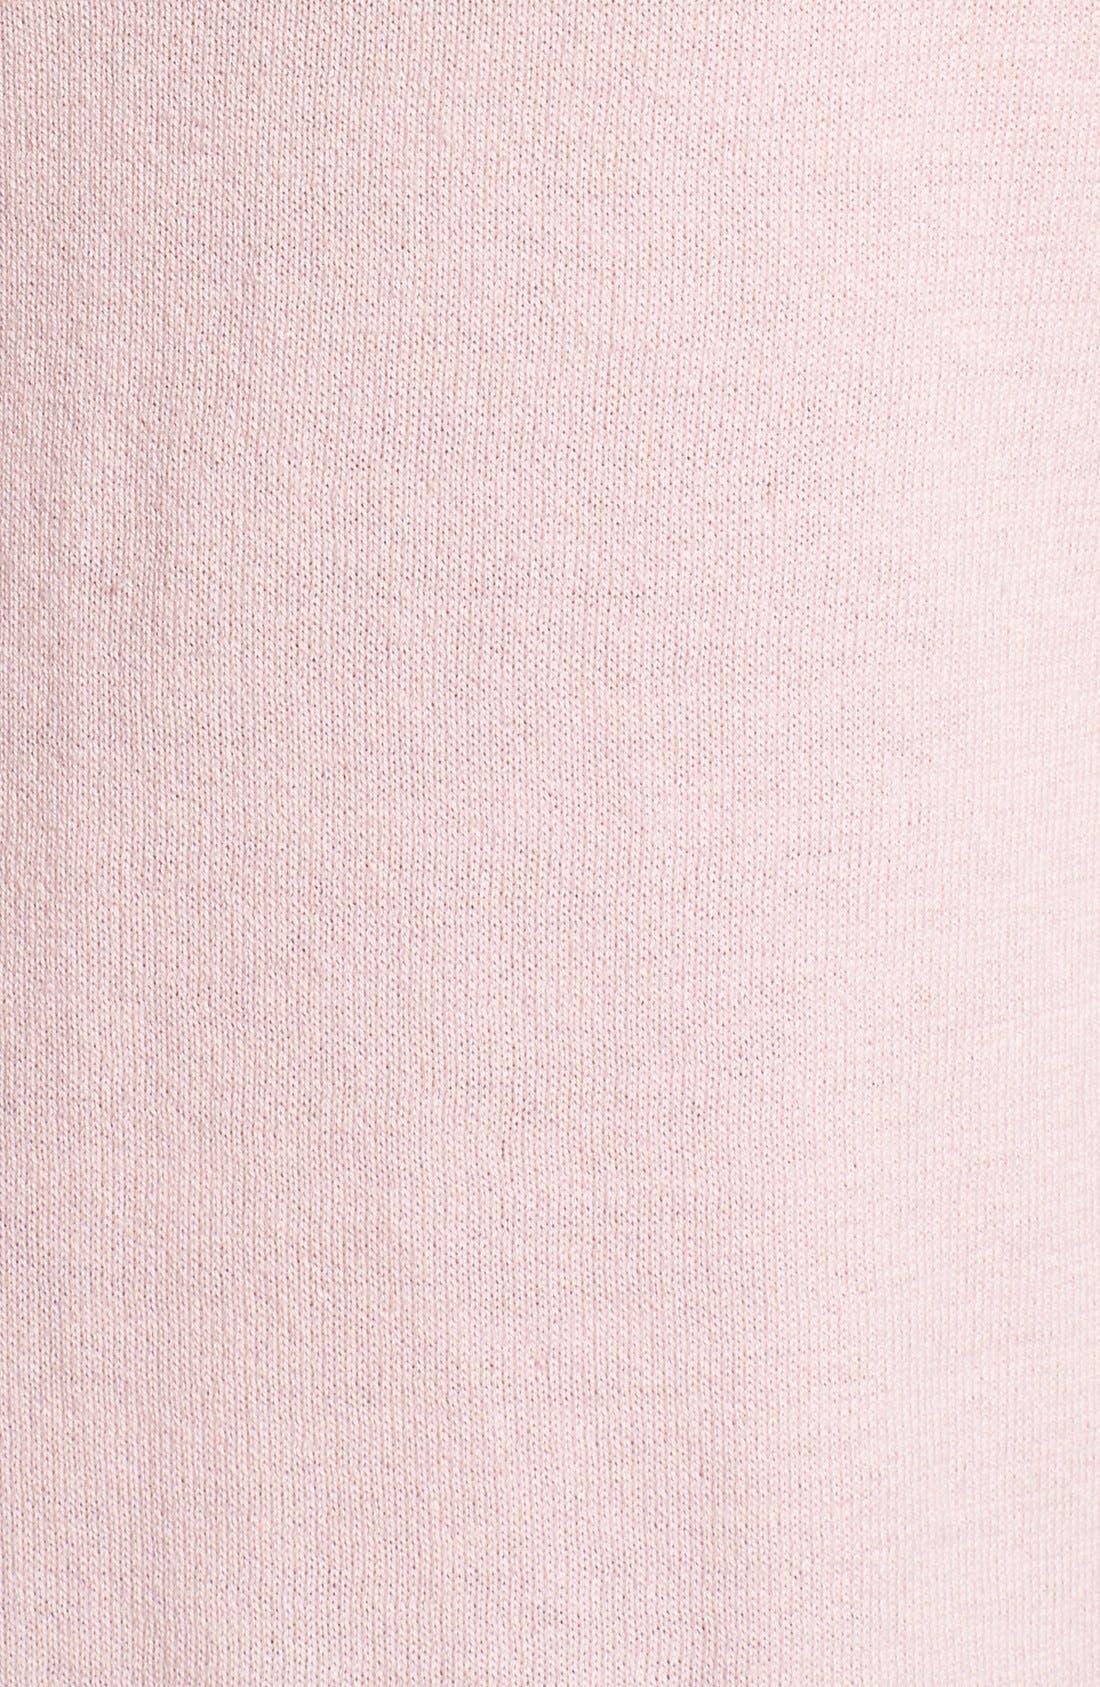 Alternate Image 3  - Vince Camuto Sheer Yoke Short Sleeve Cotton Blend Sweater